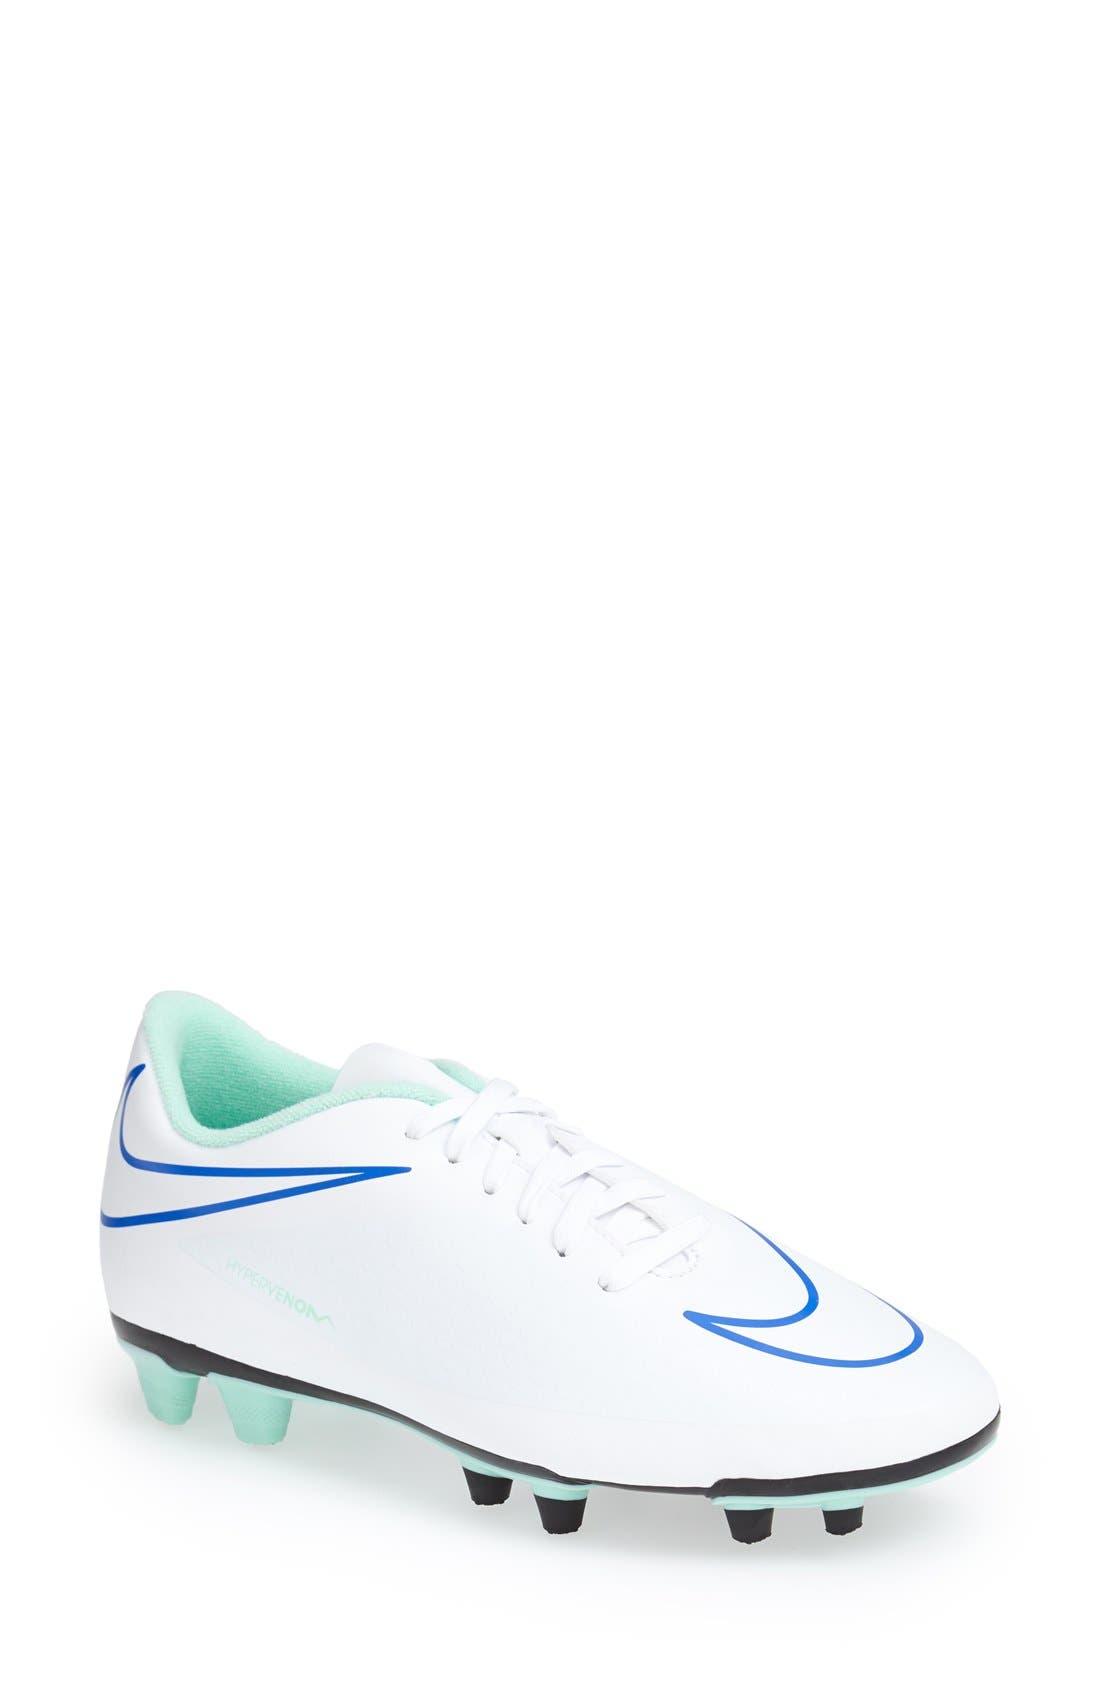 Main Image - Nike 'Hypervenom Phade' Firm Ground Soccer Cleat (Women)